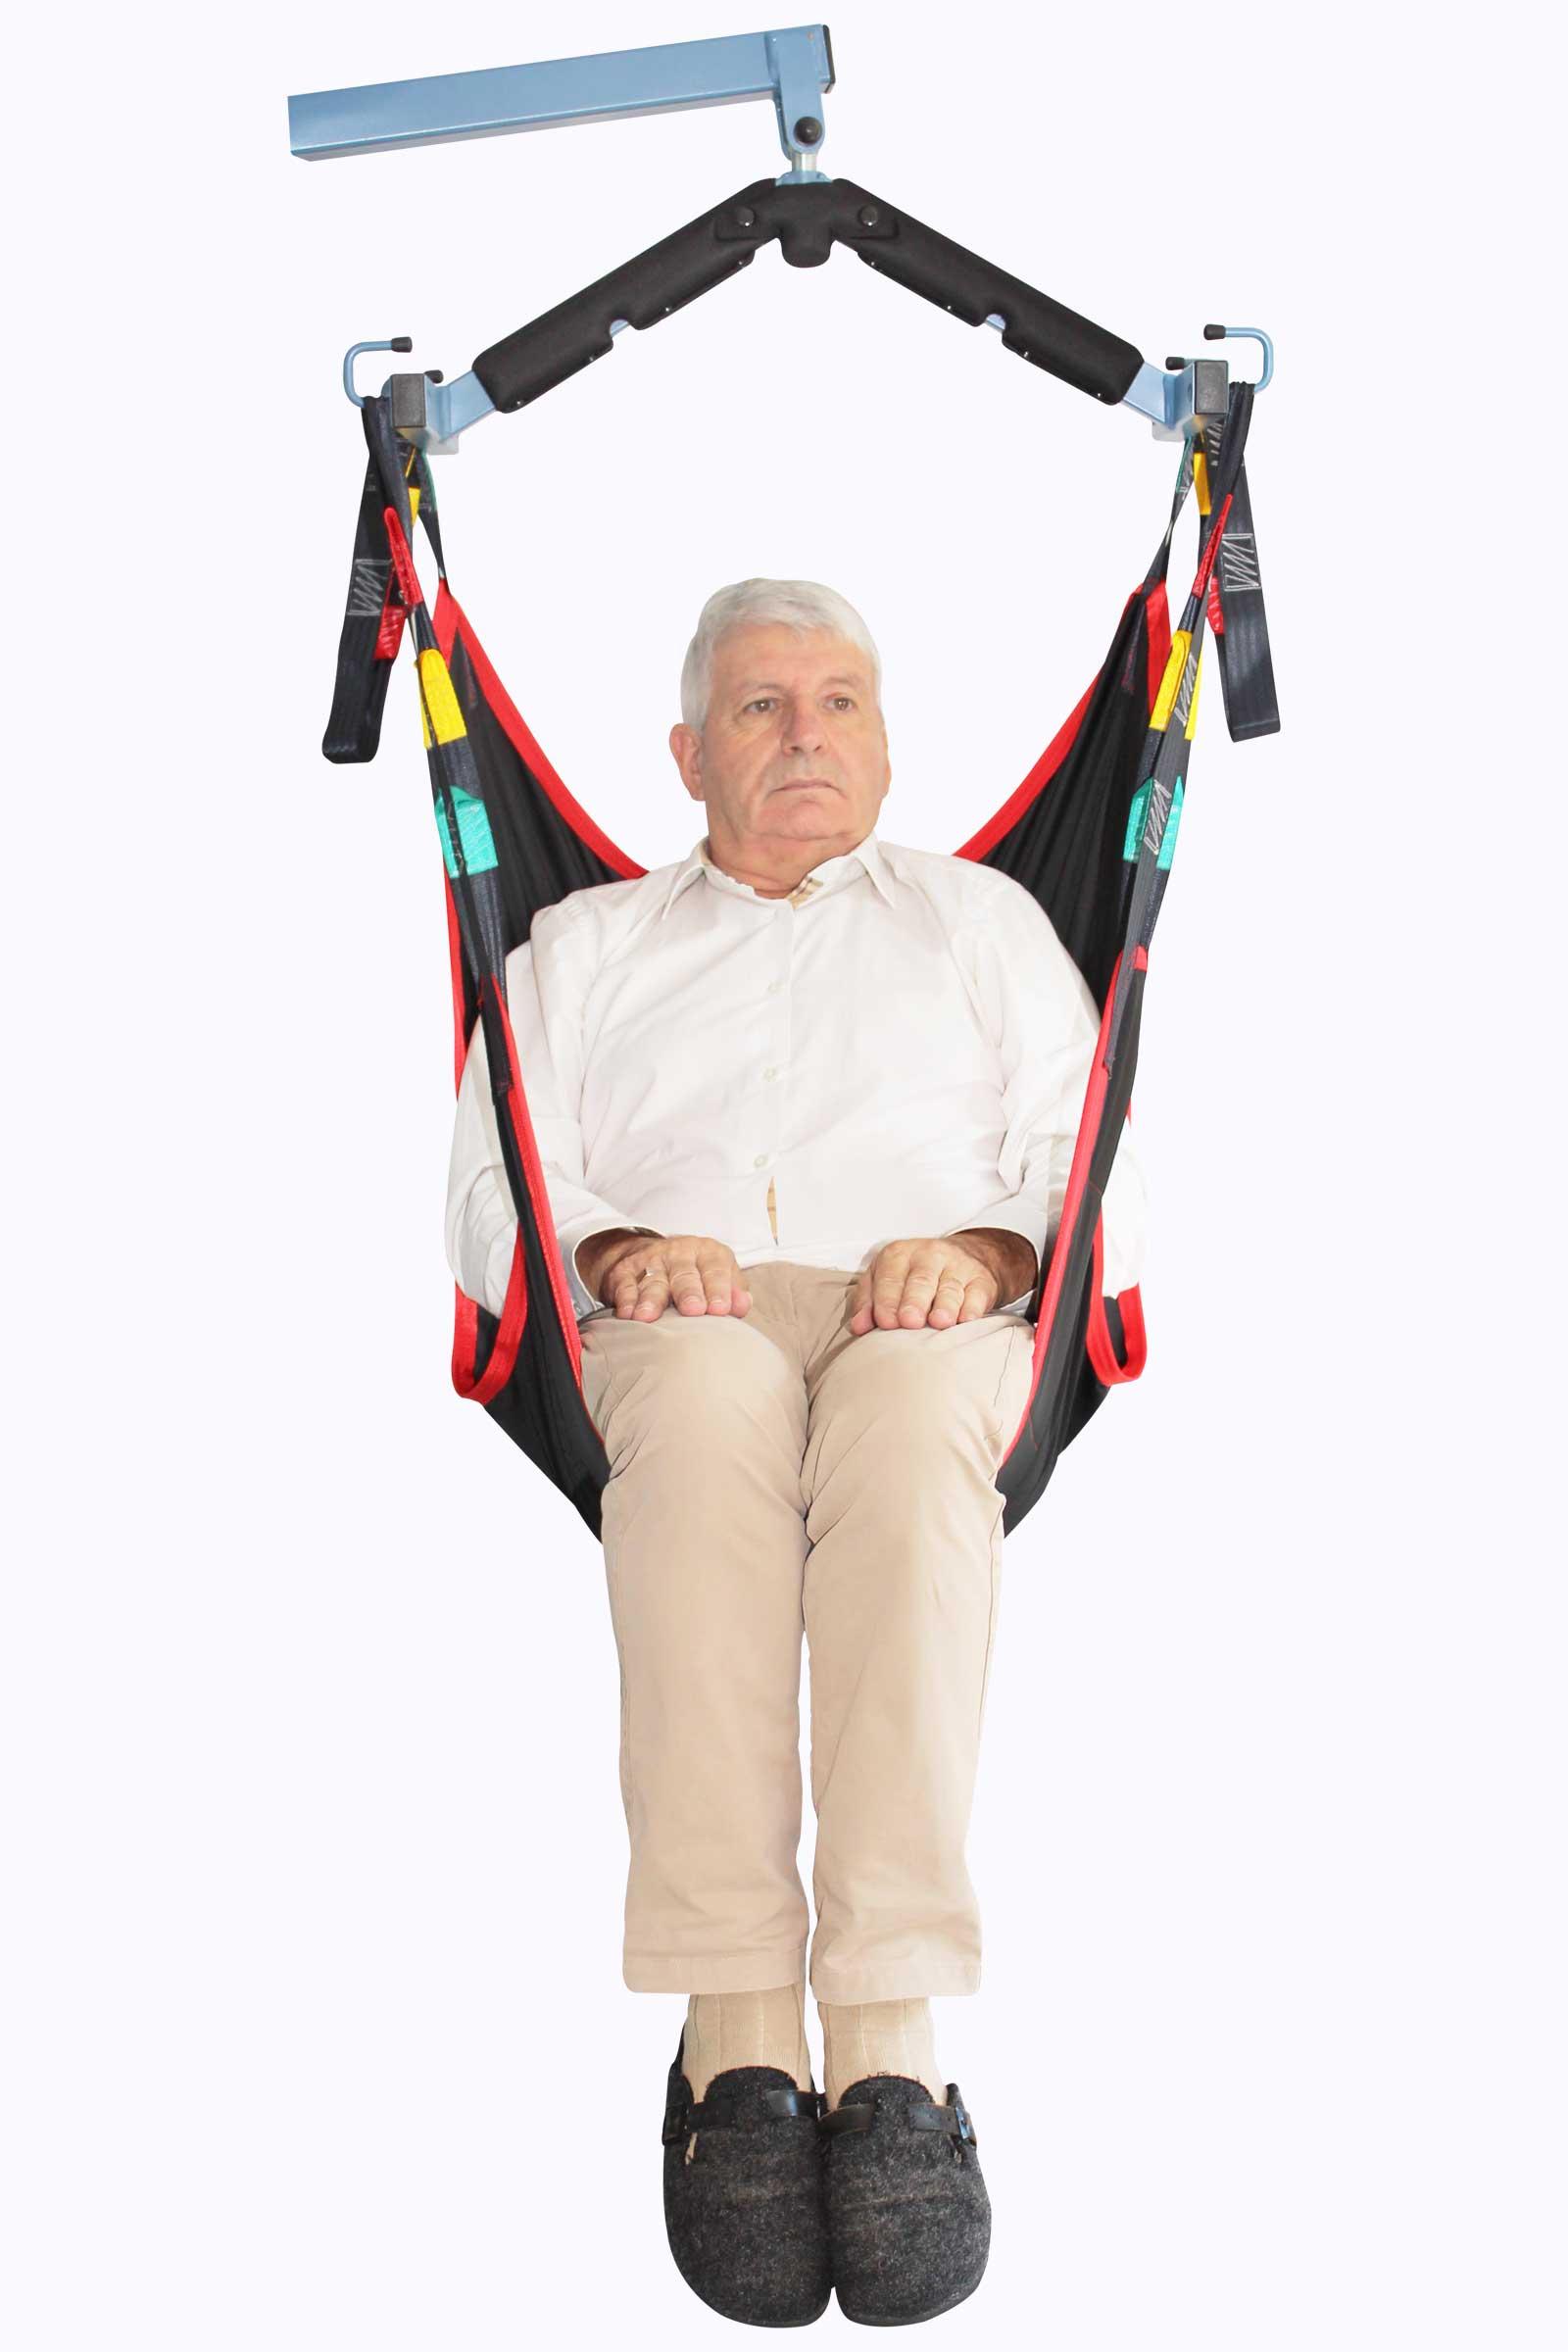 Nausicaa Medical Patient Lift Slings Standard Comfort